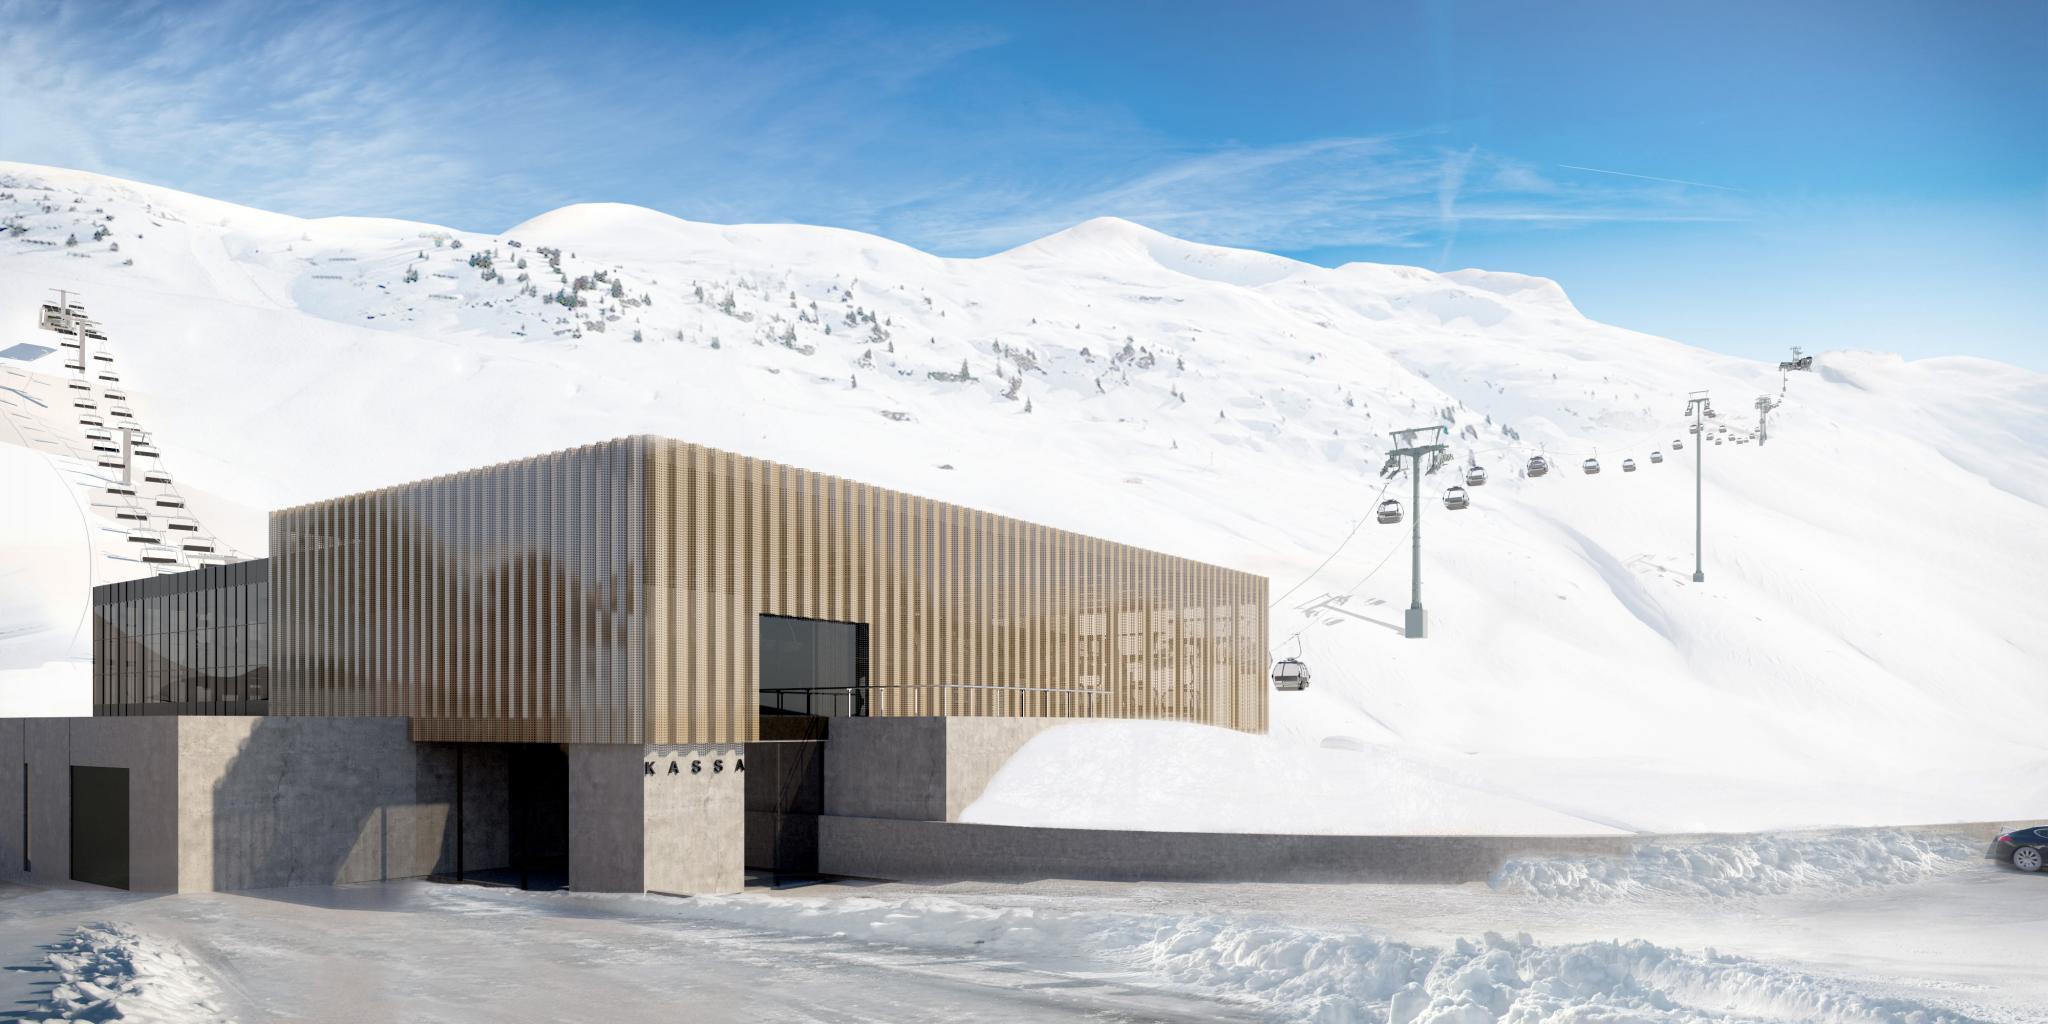 lech ski station